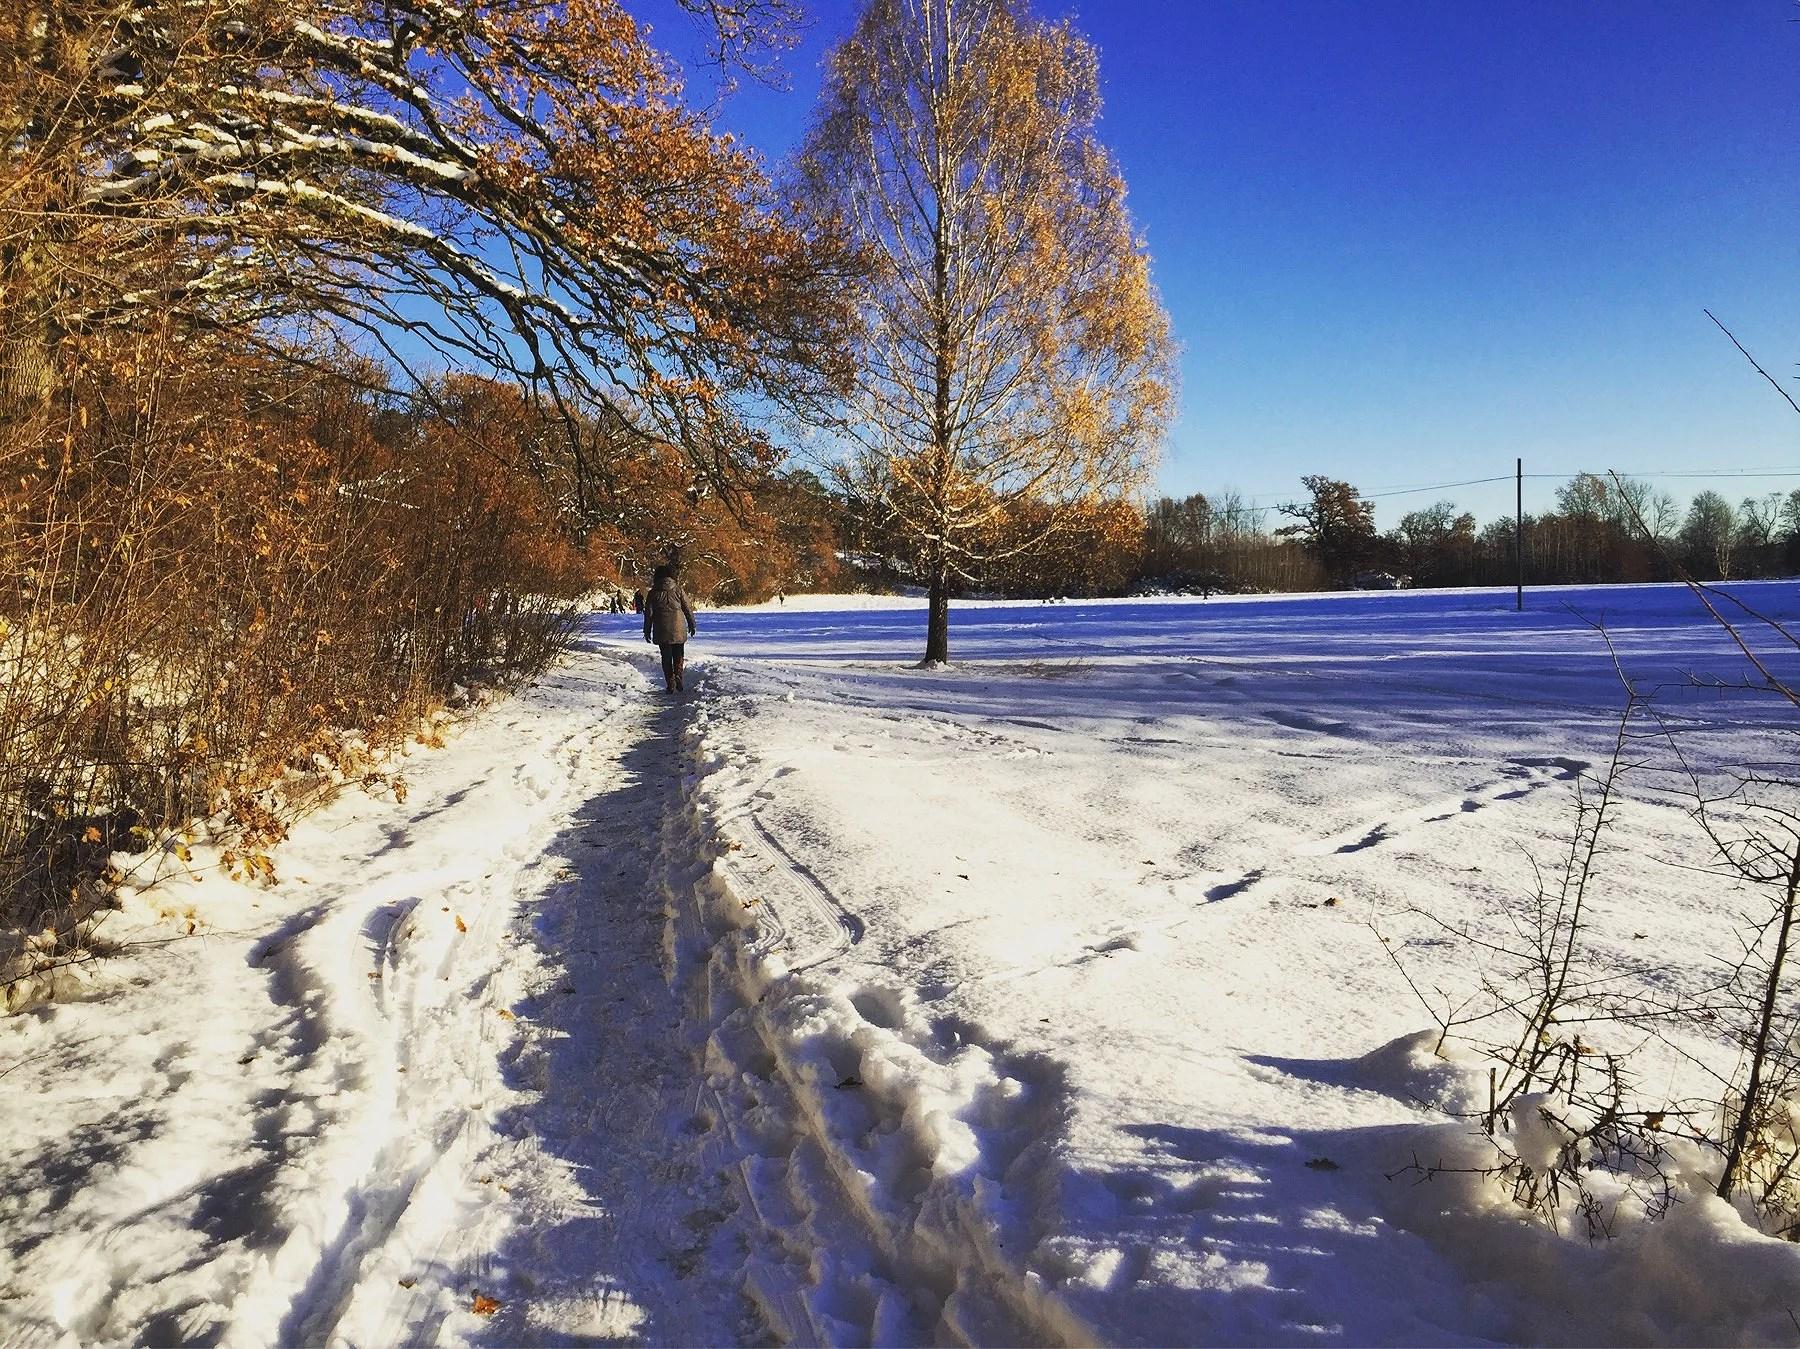 Fint väder